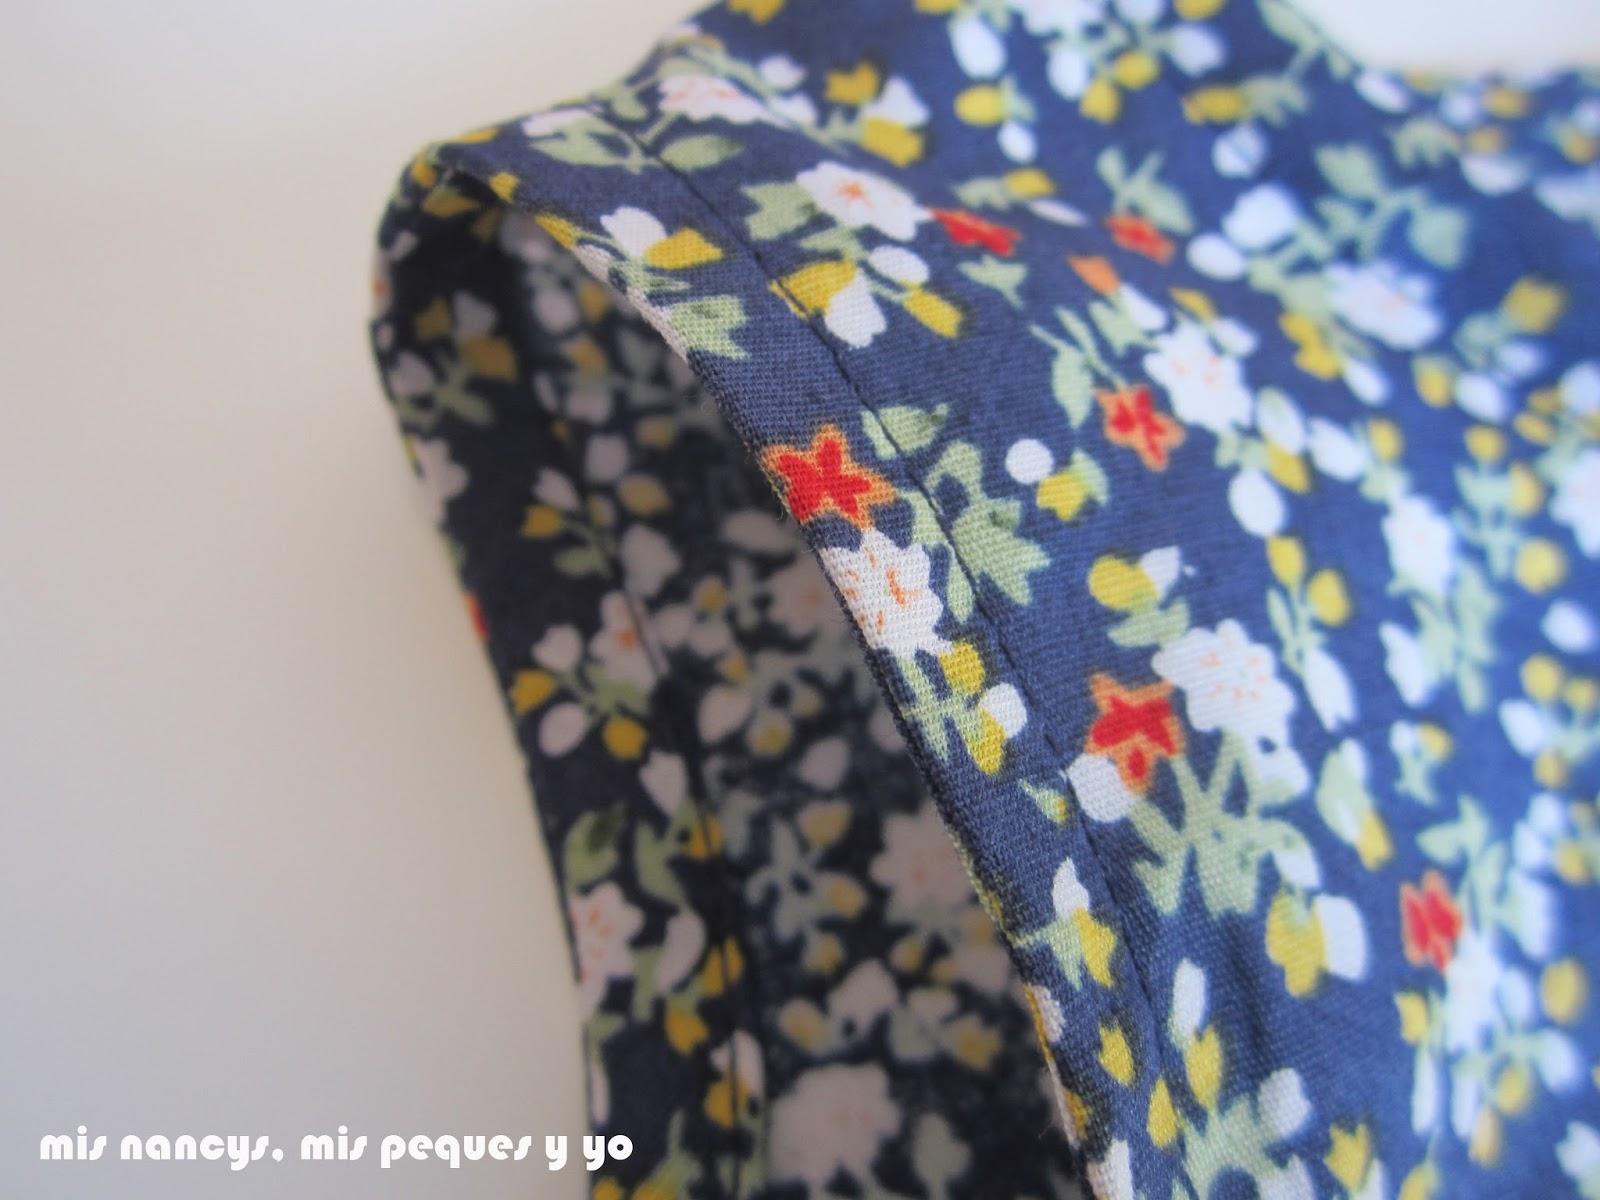 mis nancys, mis peques y yo, tutorial blusa sin mangas niña (patrón gratis), blusa terminada detalle mangas